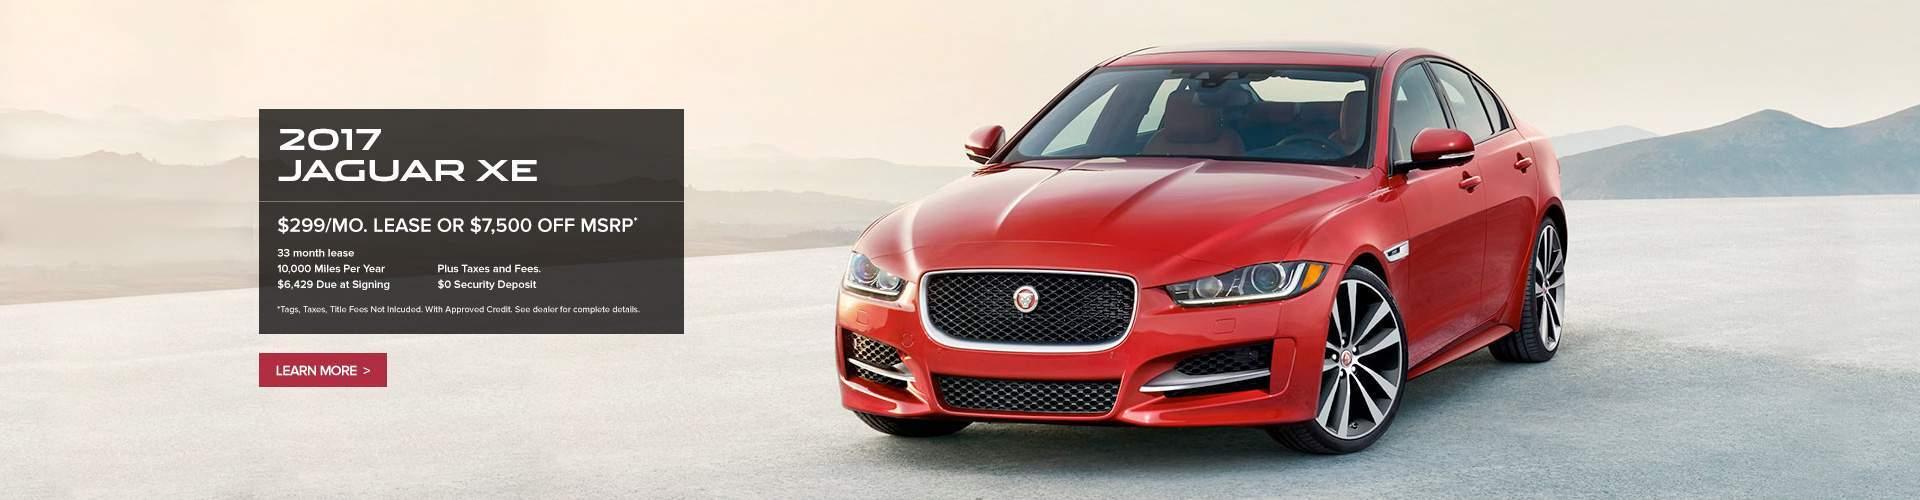 hill when cherry htm jaguar dealership me dealers near vehicle features in nj technology